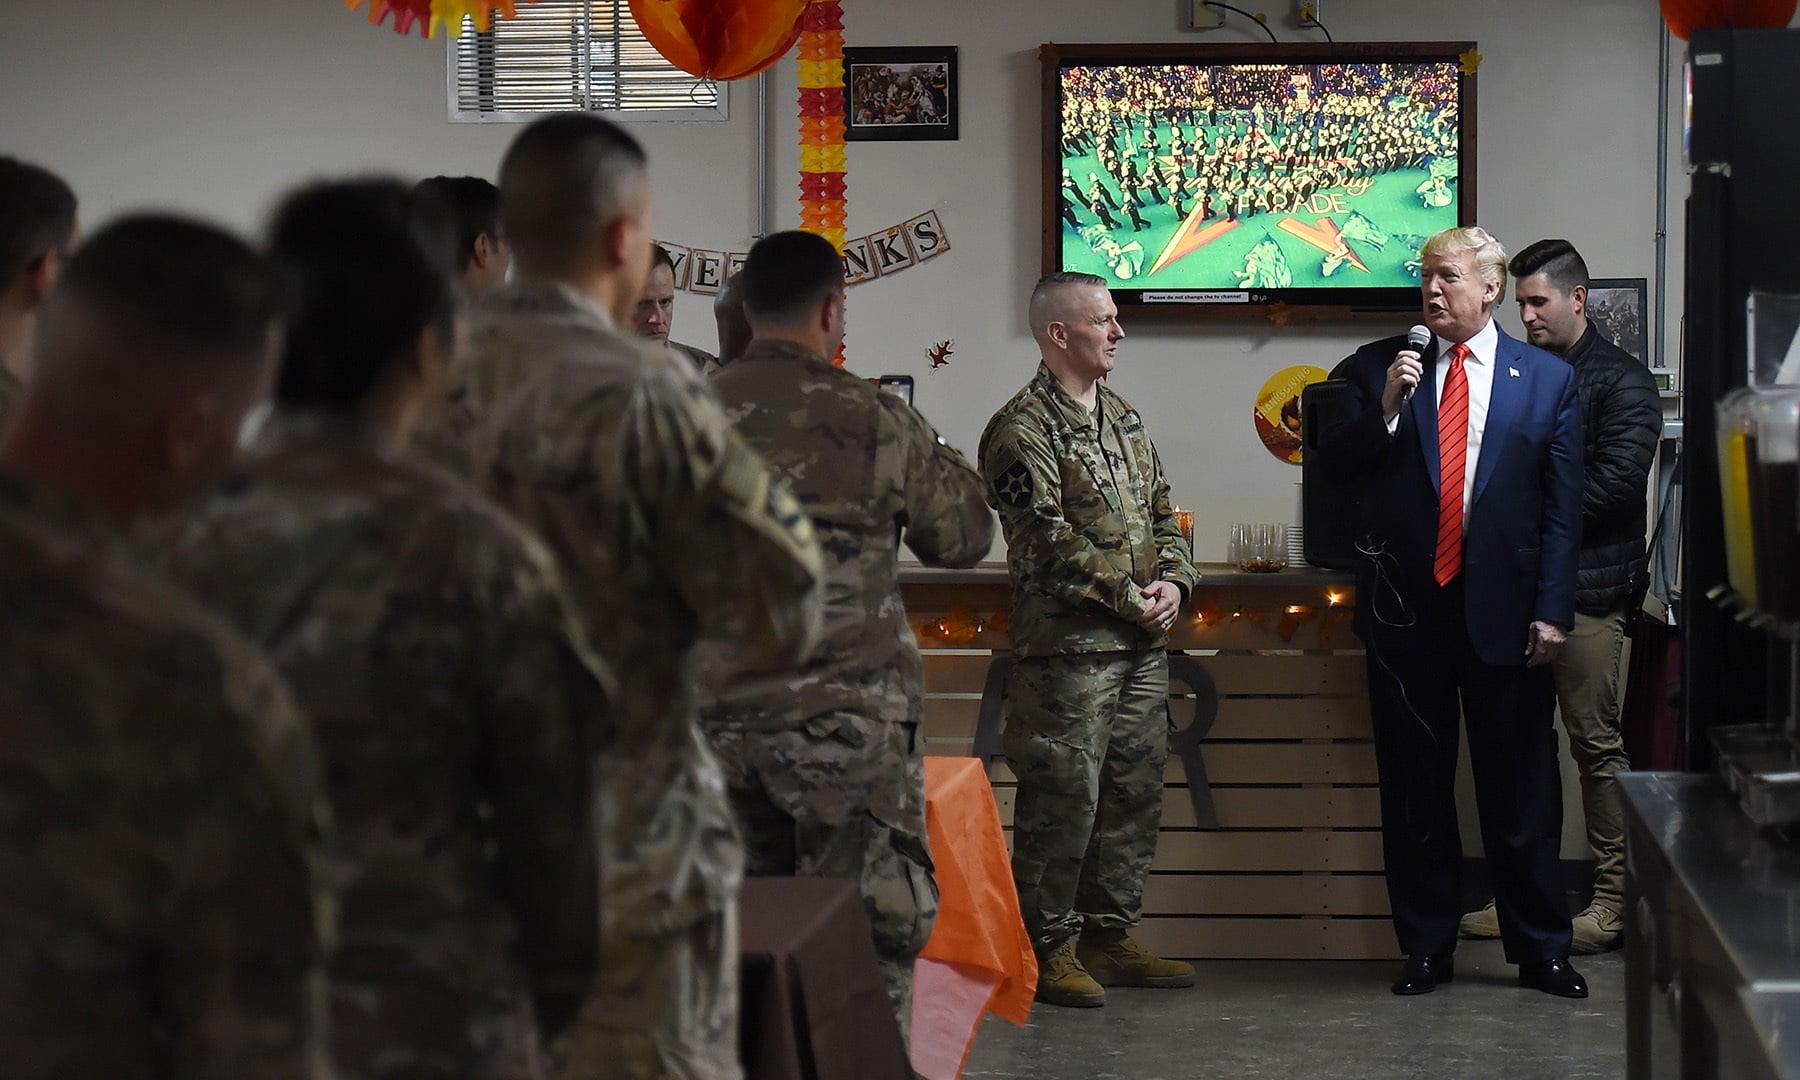 US President Donald Trump speaks to US troops at Bagram Air Field during a surprise visit on November 28 in Afghanistan. — AFP